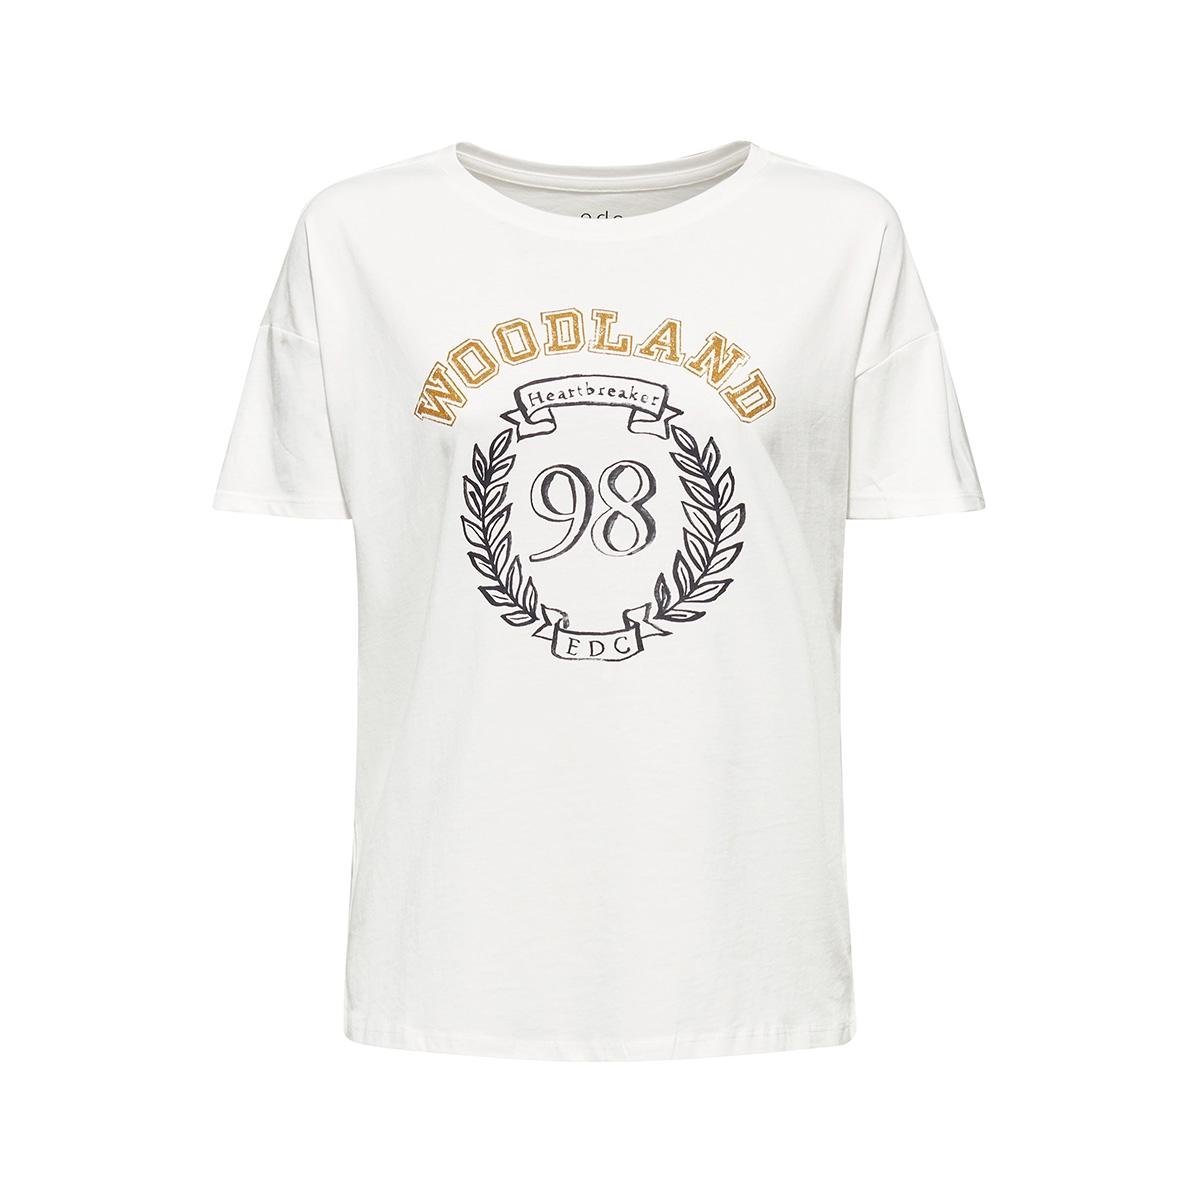 t shirt met print 099cc1k018 edc t-shirt c110